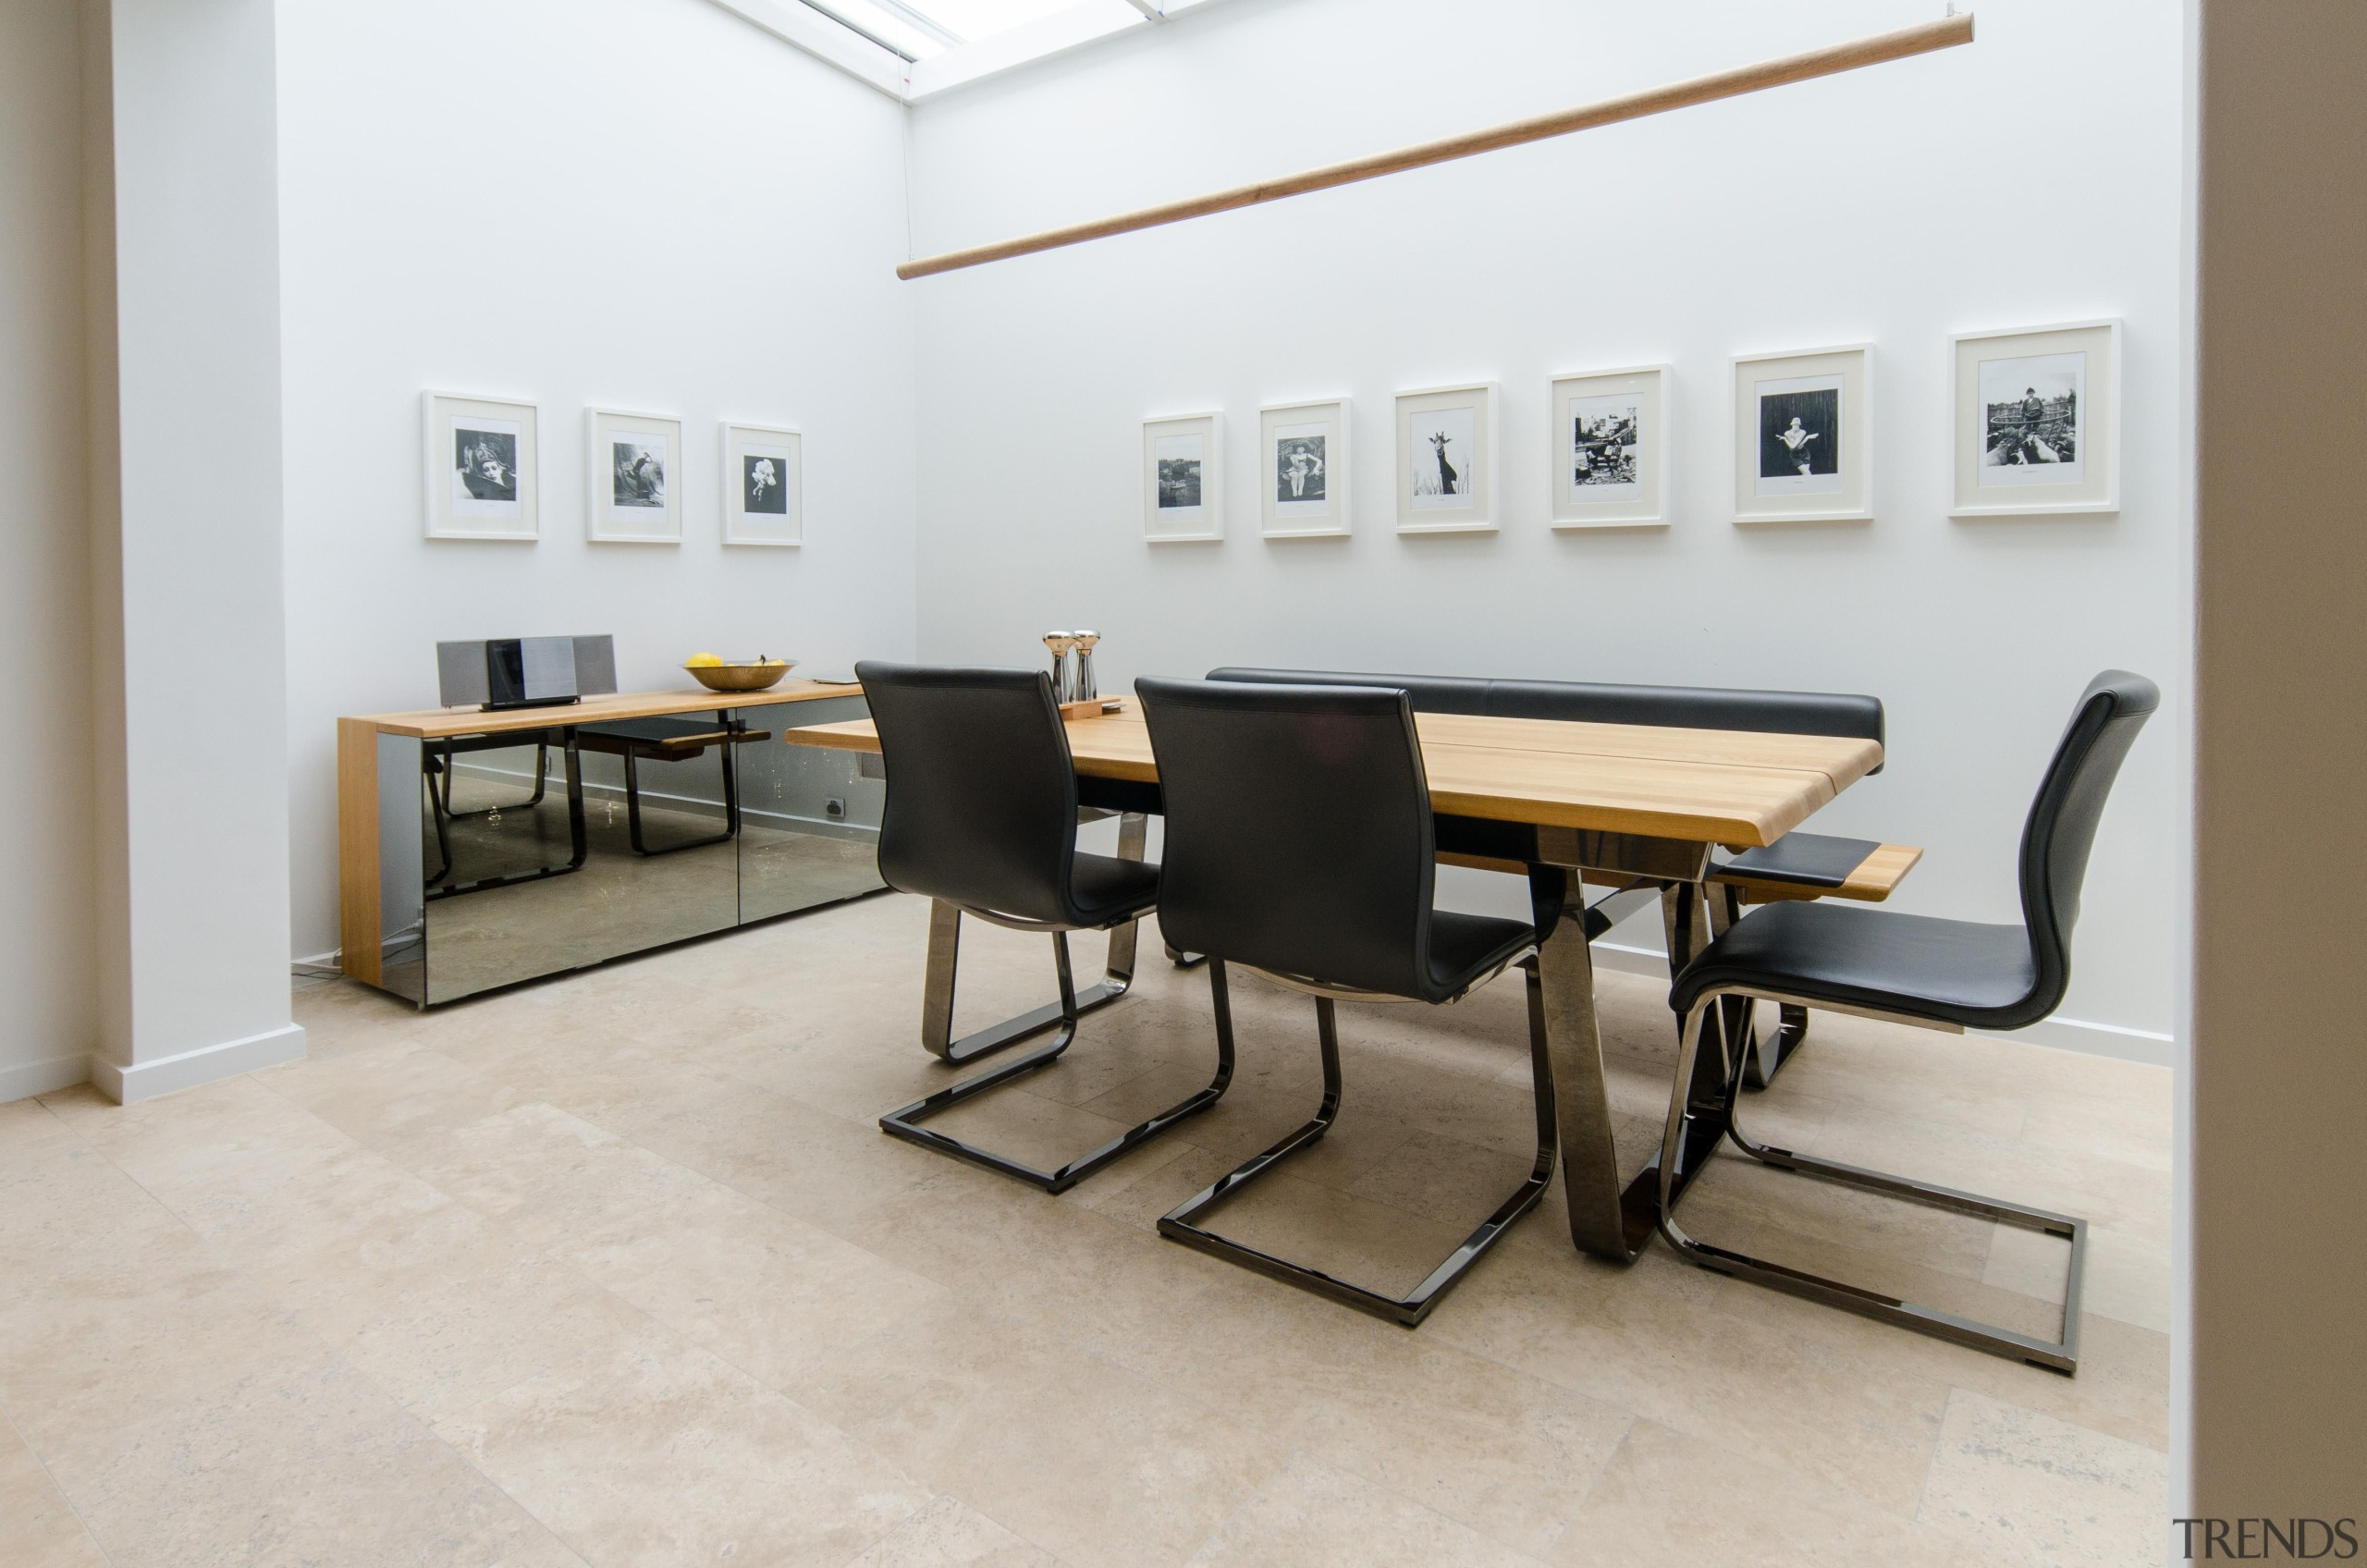 Pepper Design - Team 7 Kitchen - chair chair, floor, flooring, furniture, interior design, office, product design, table, white, gray